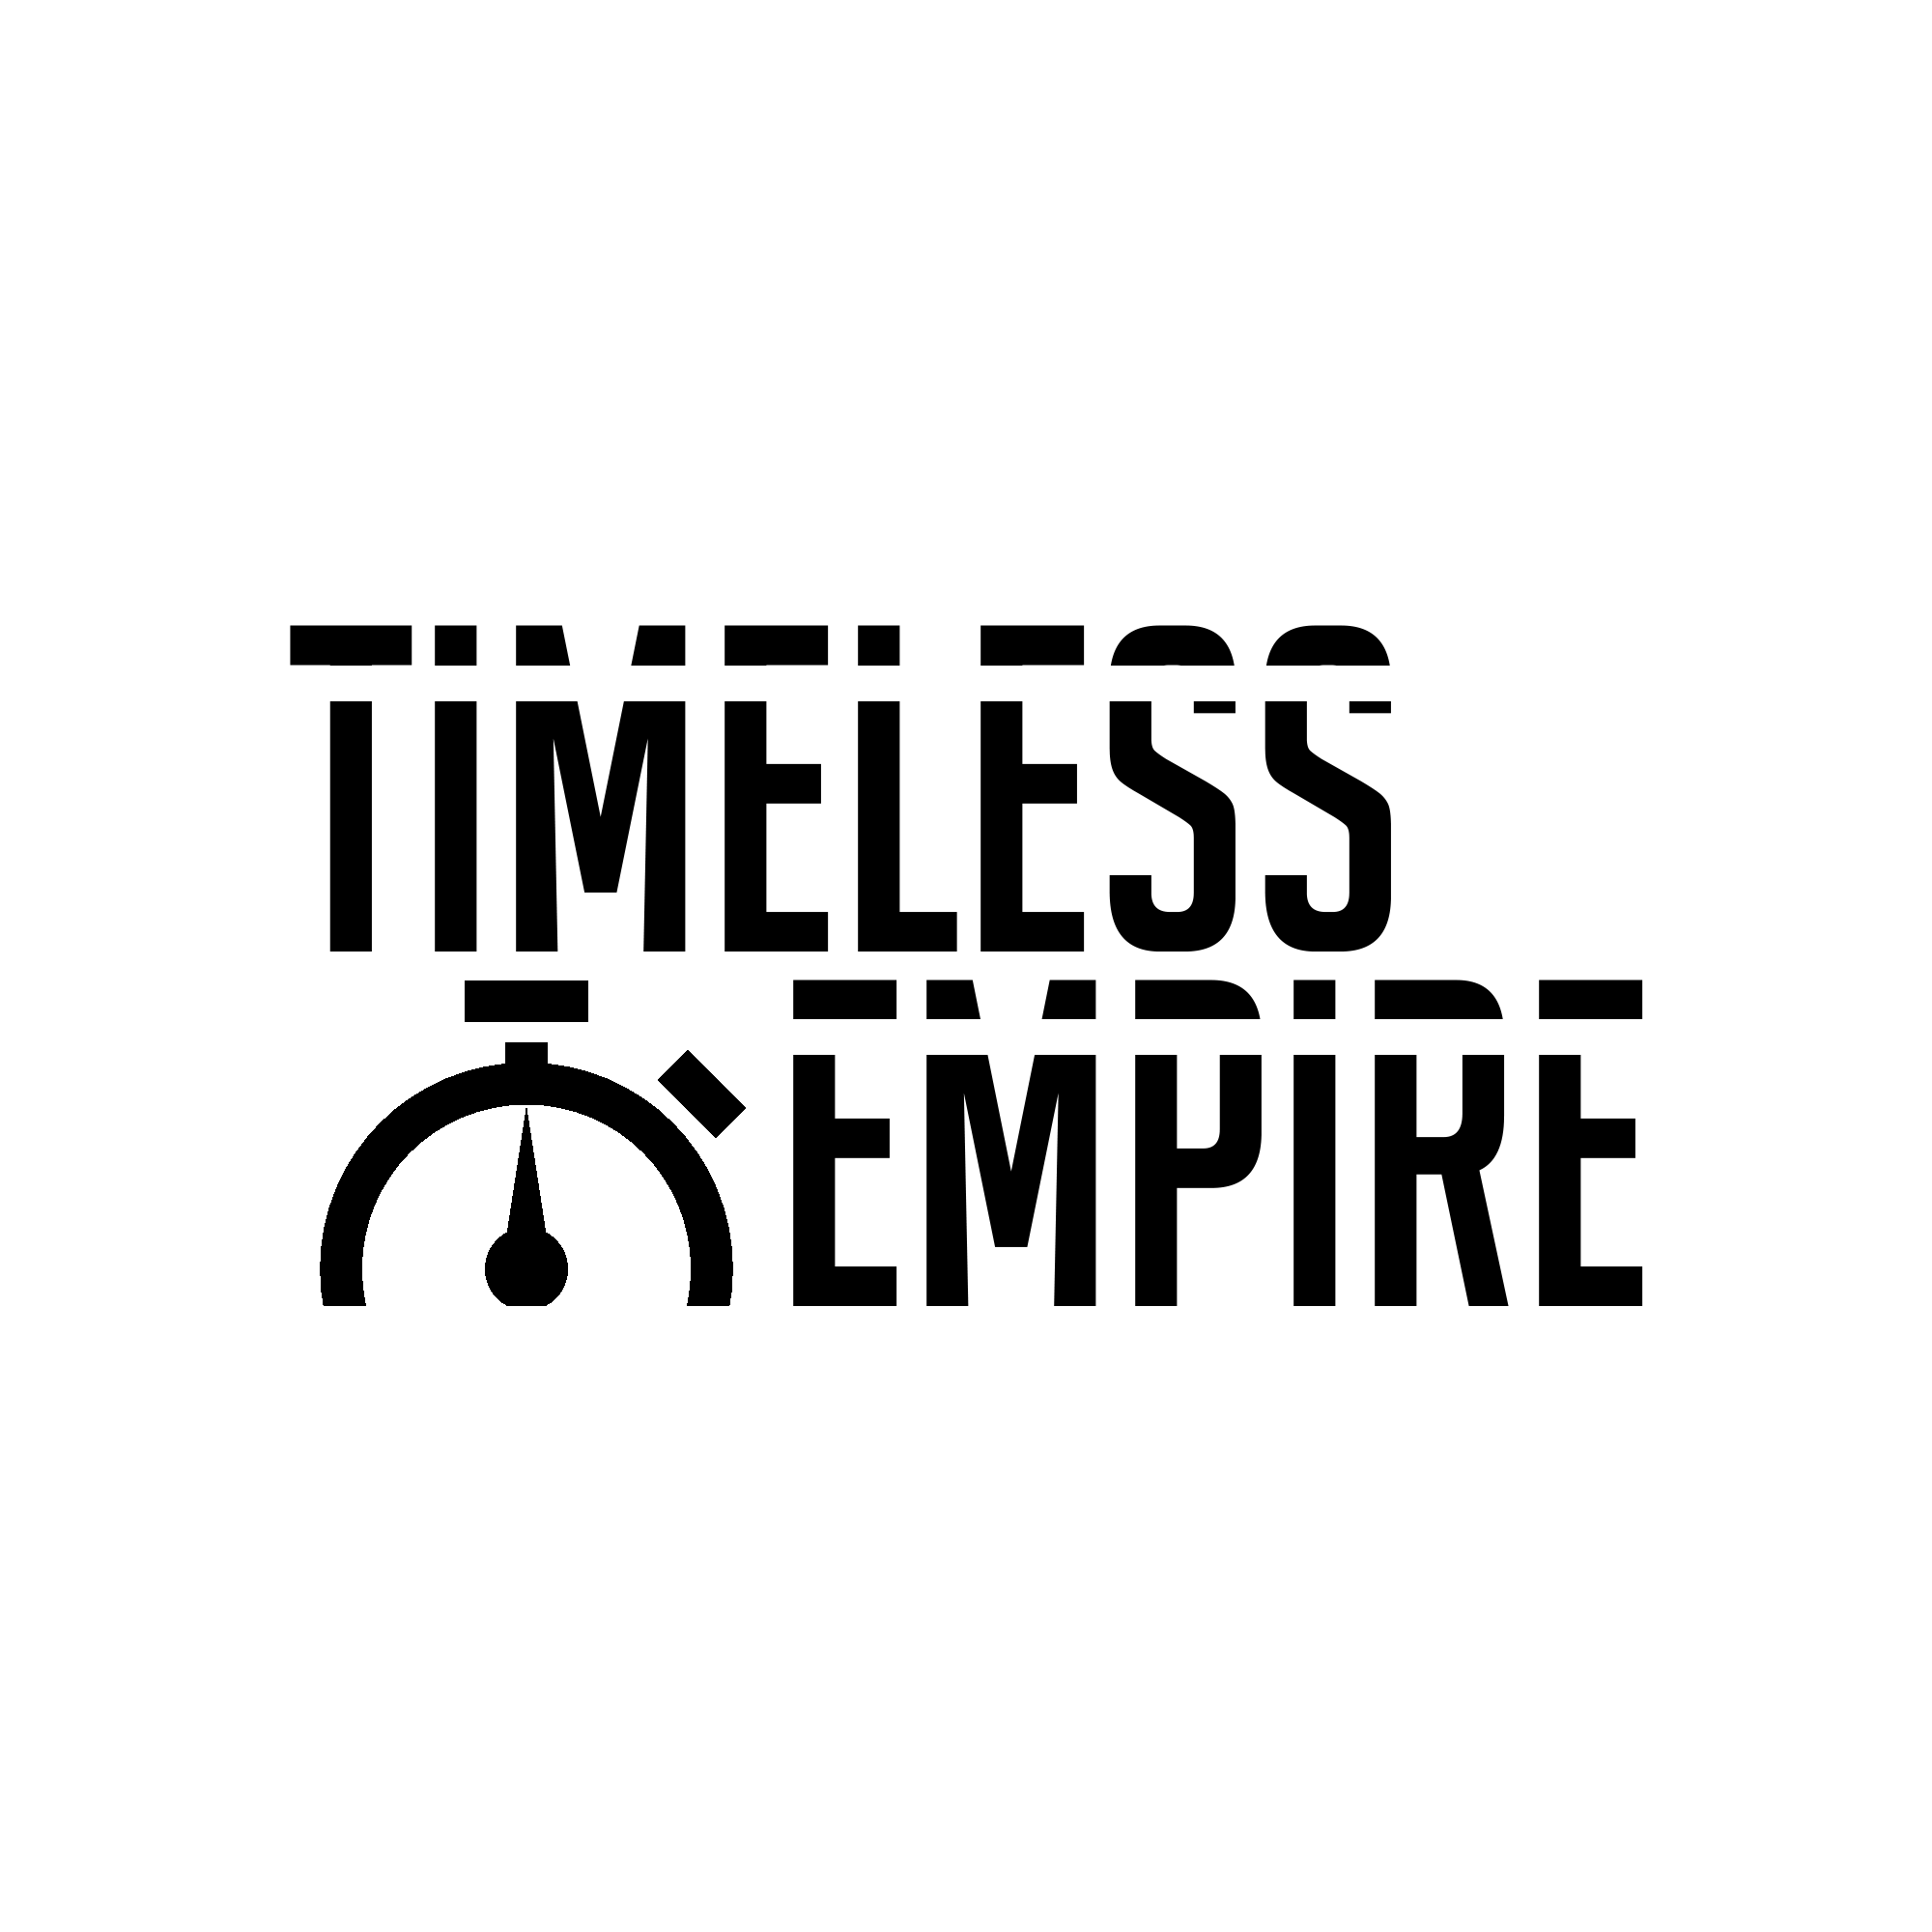 Timeless Empire Logo